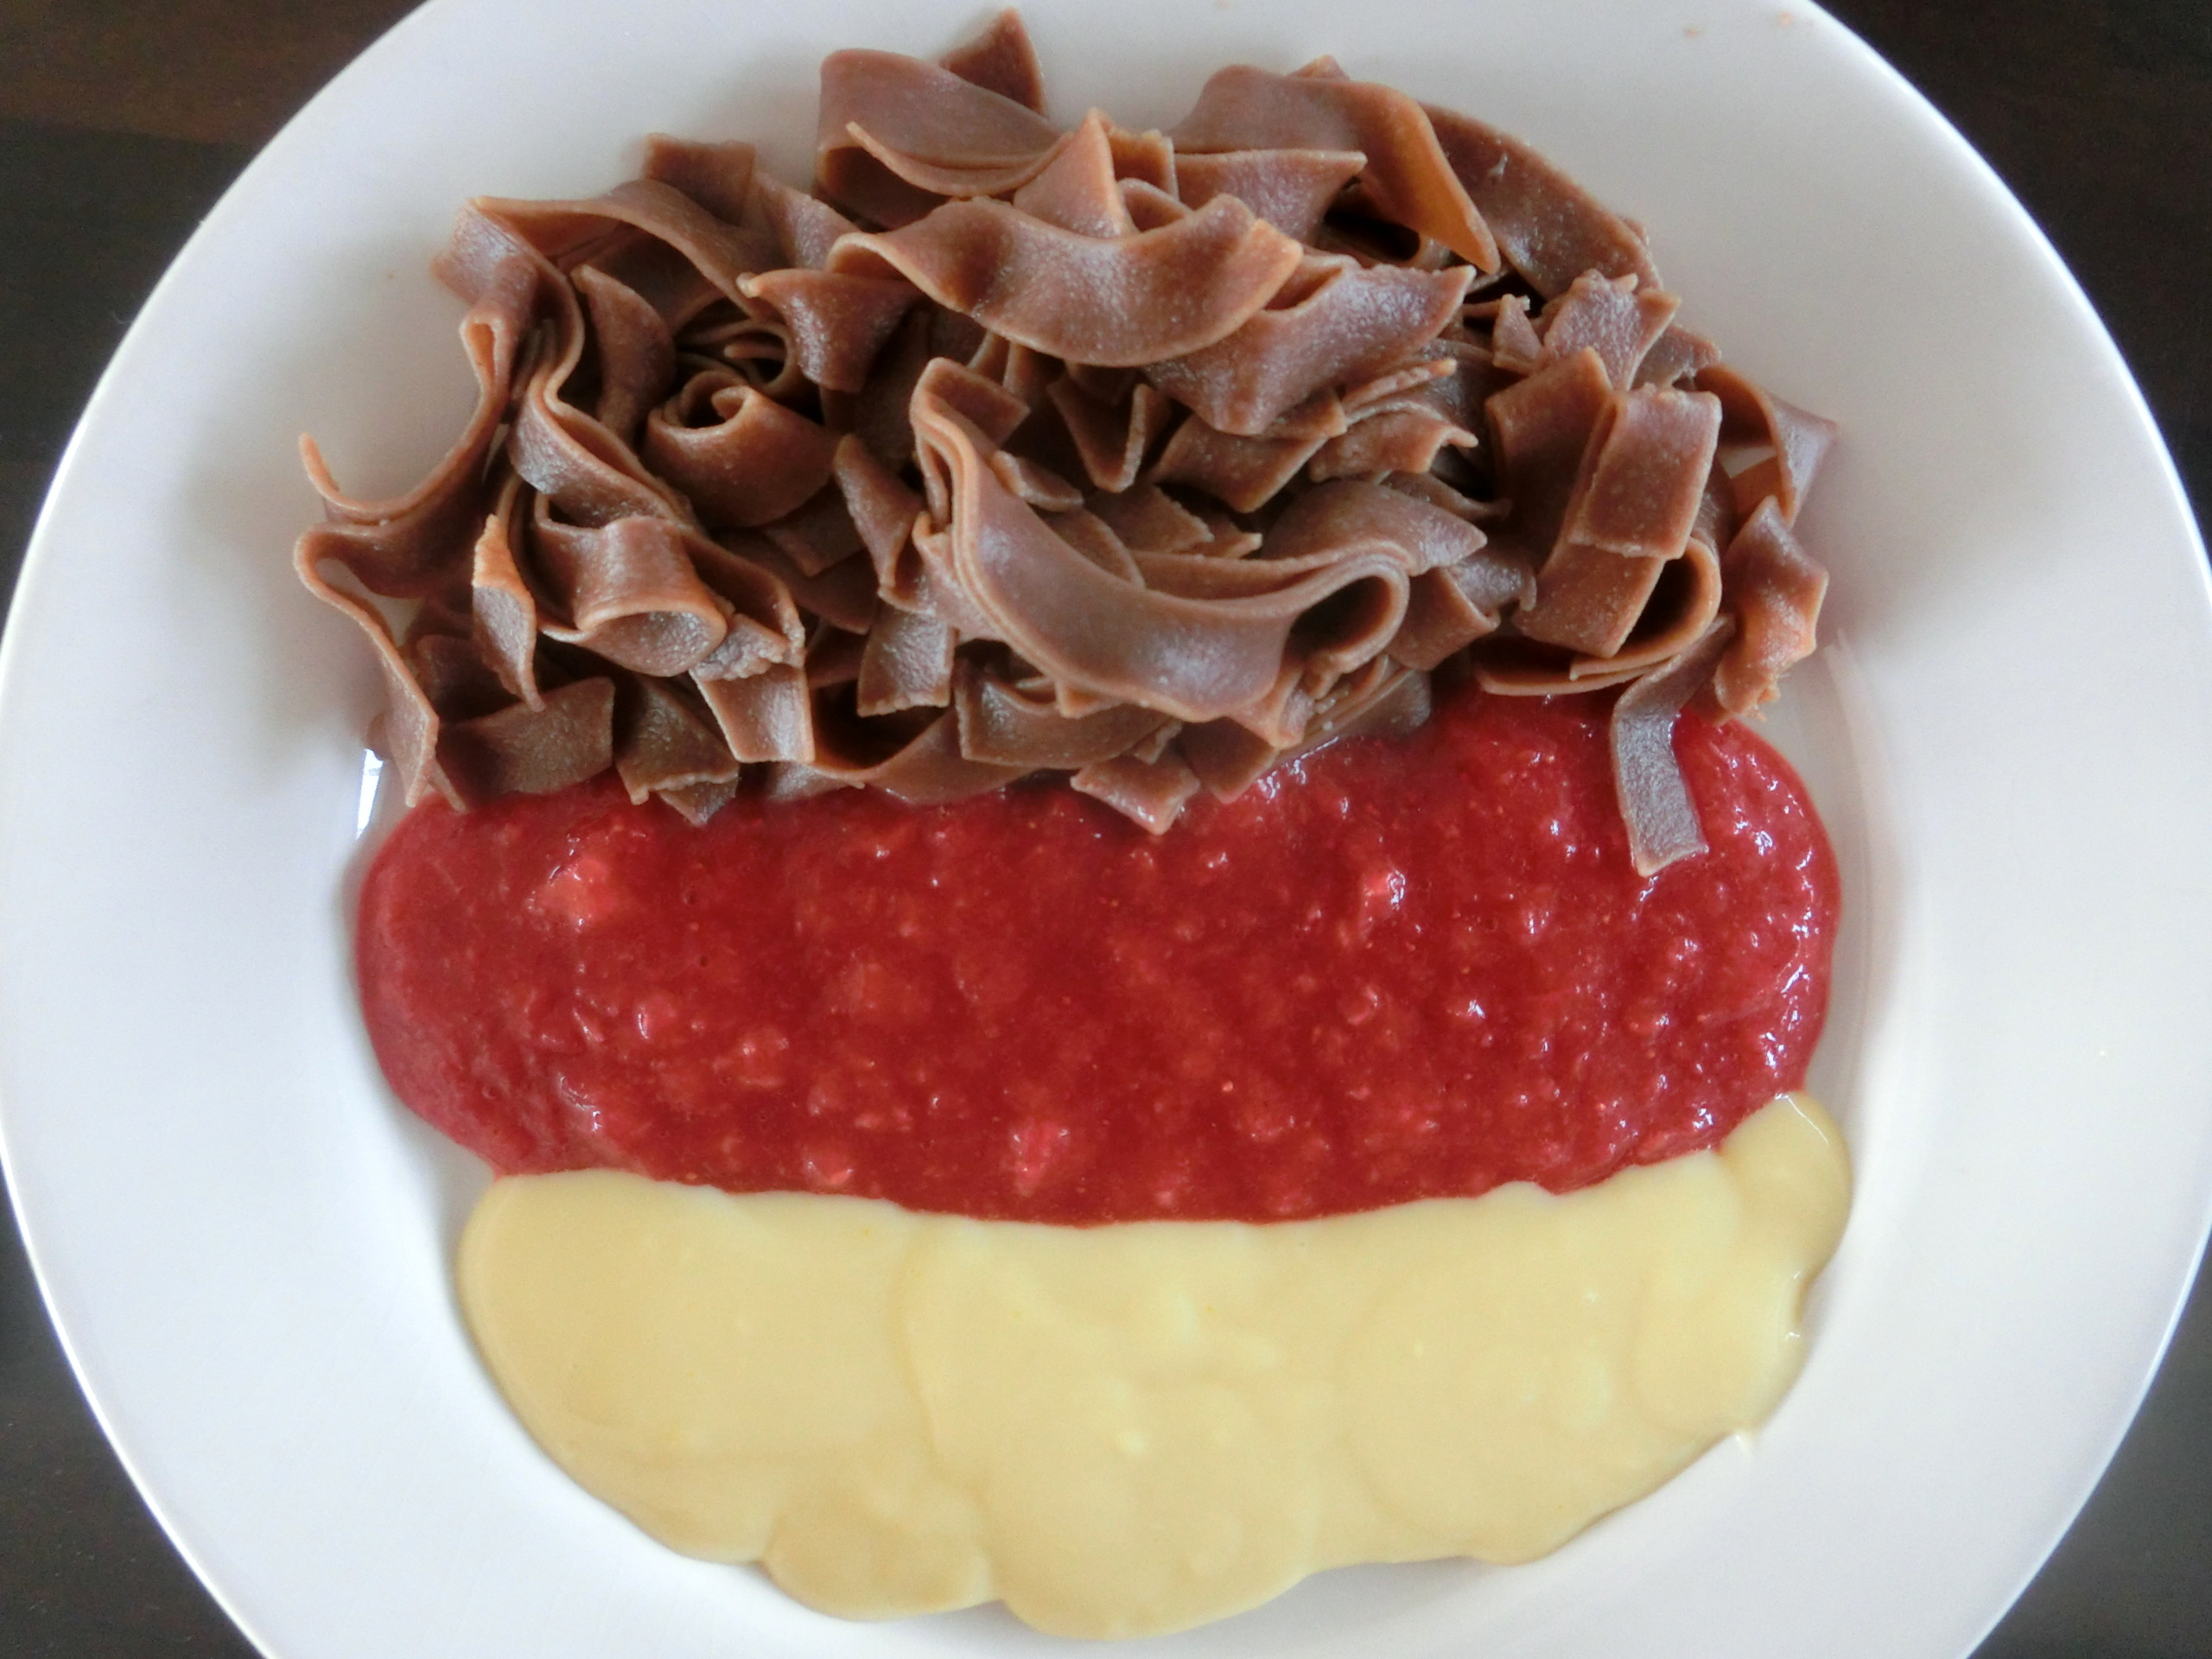 WM fever with chocolate pasta, strawberry and vanilla sauce